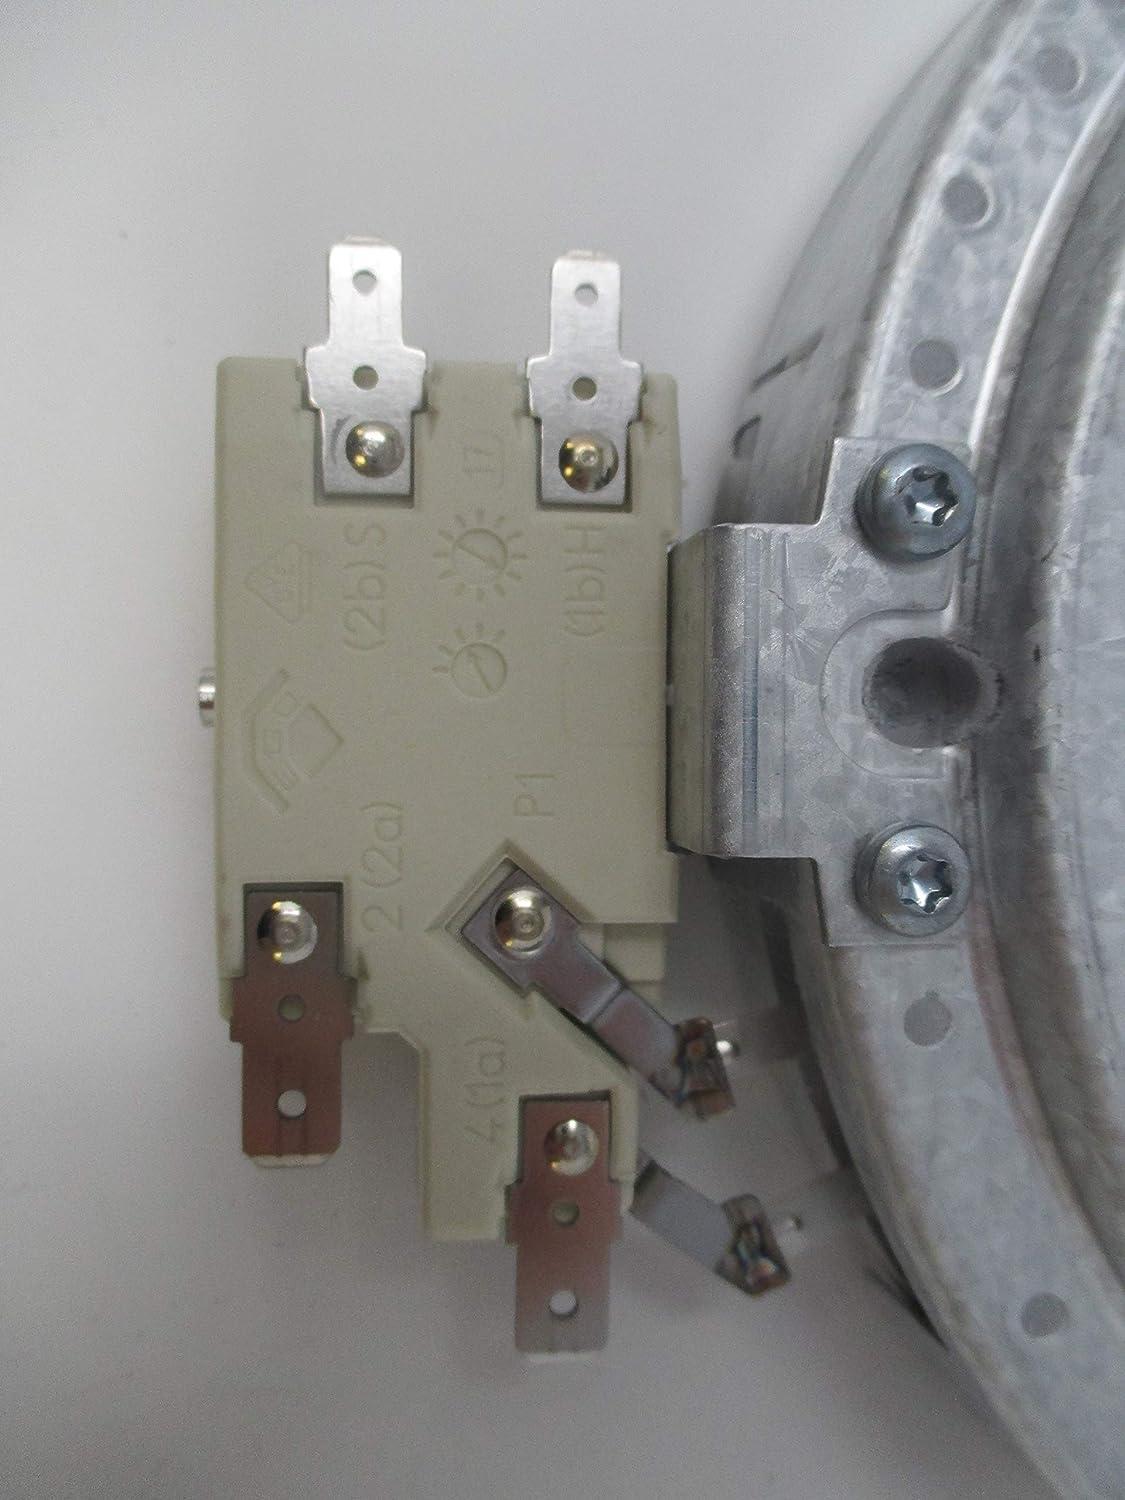 W10339426 Replaces W10490037 AP6022235 EXPW10490037 Range Control Knob PS11755567 WPW10490037 White